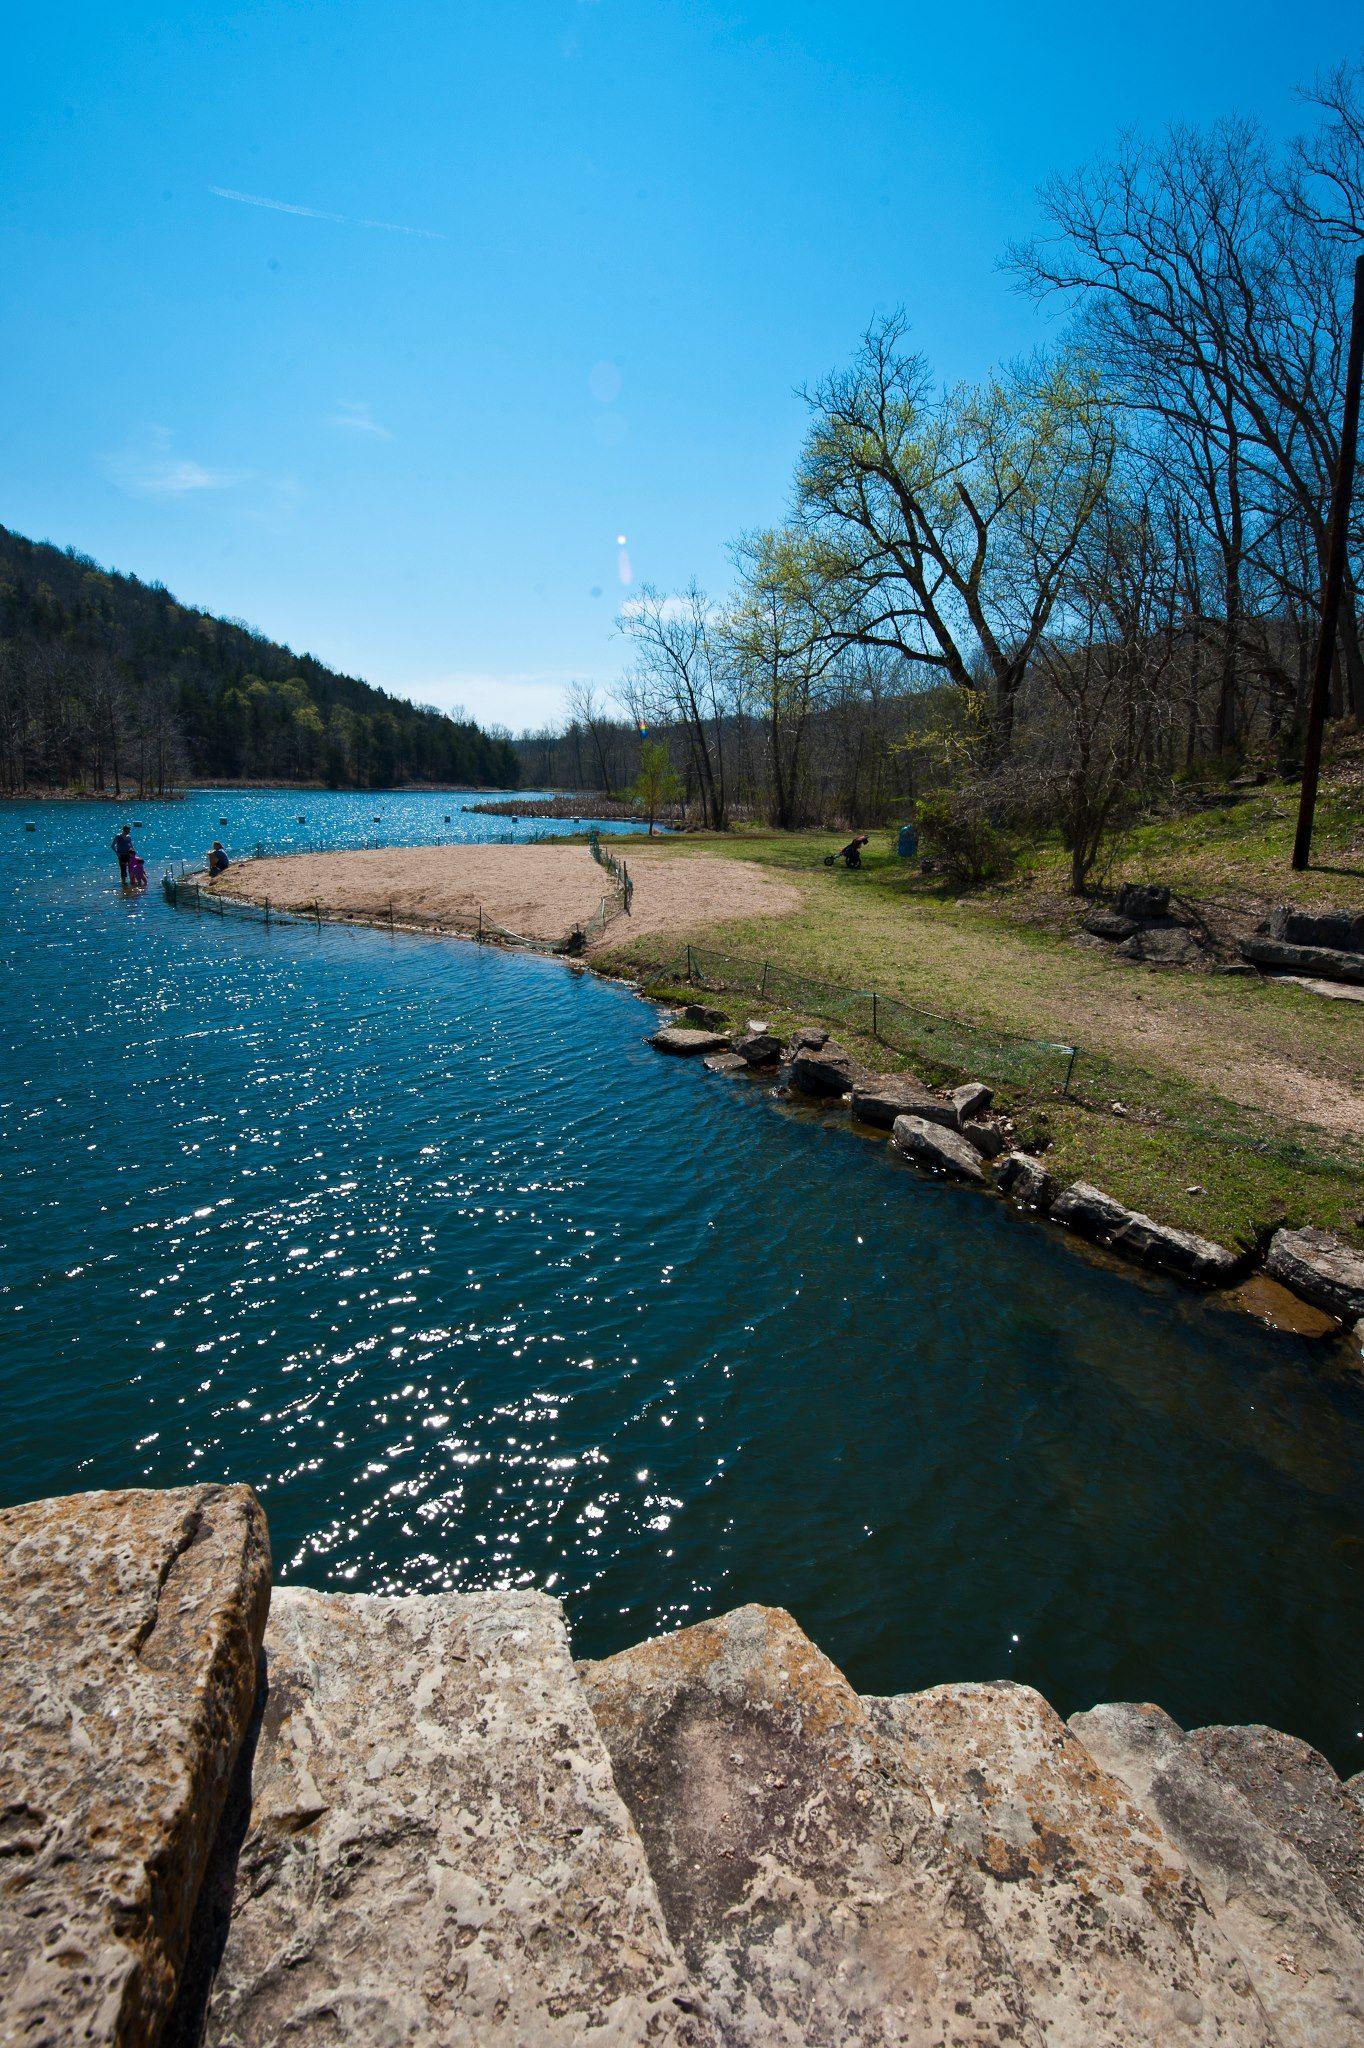 Lake Leatherwood City Park, Eureka Springs, Arkansas